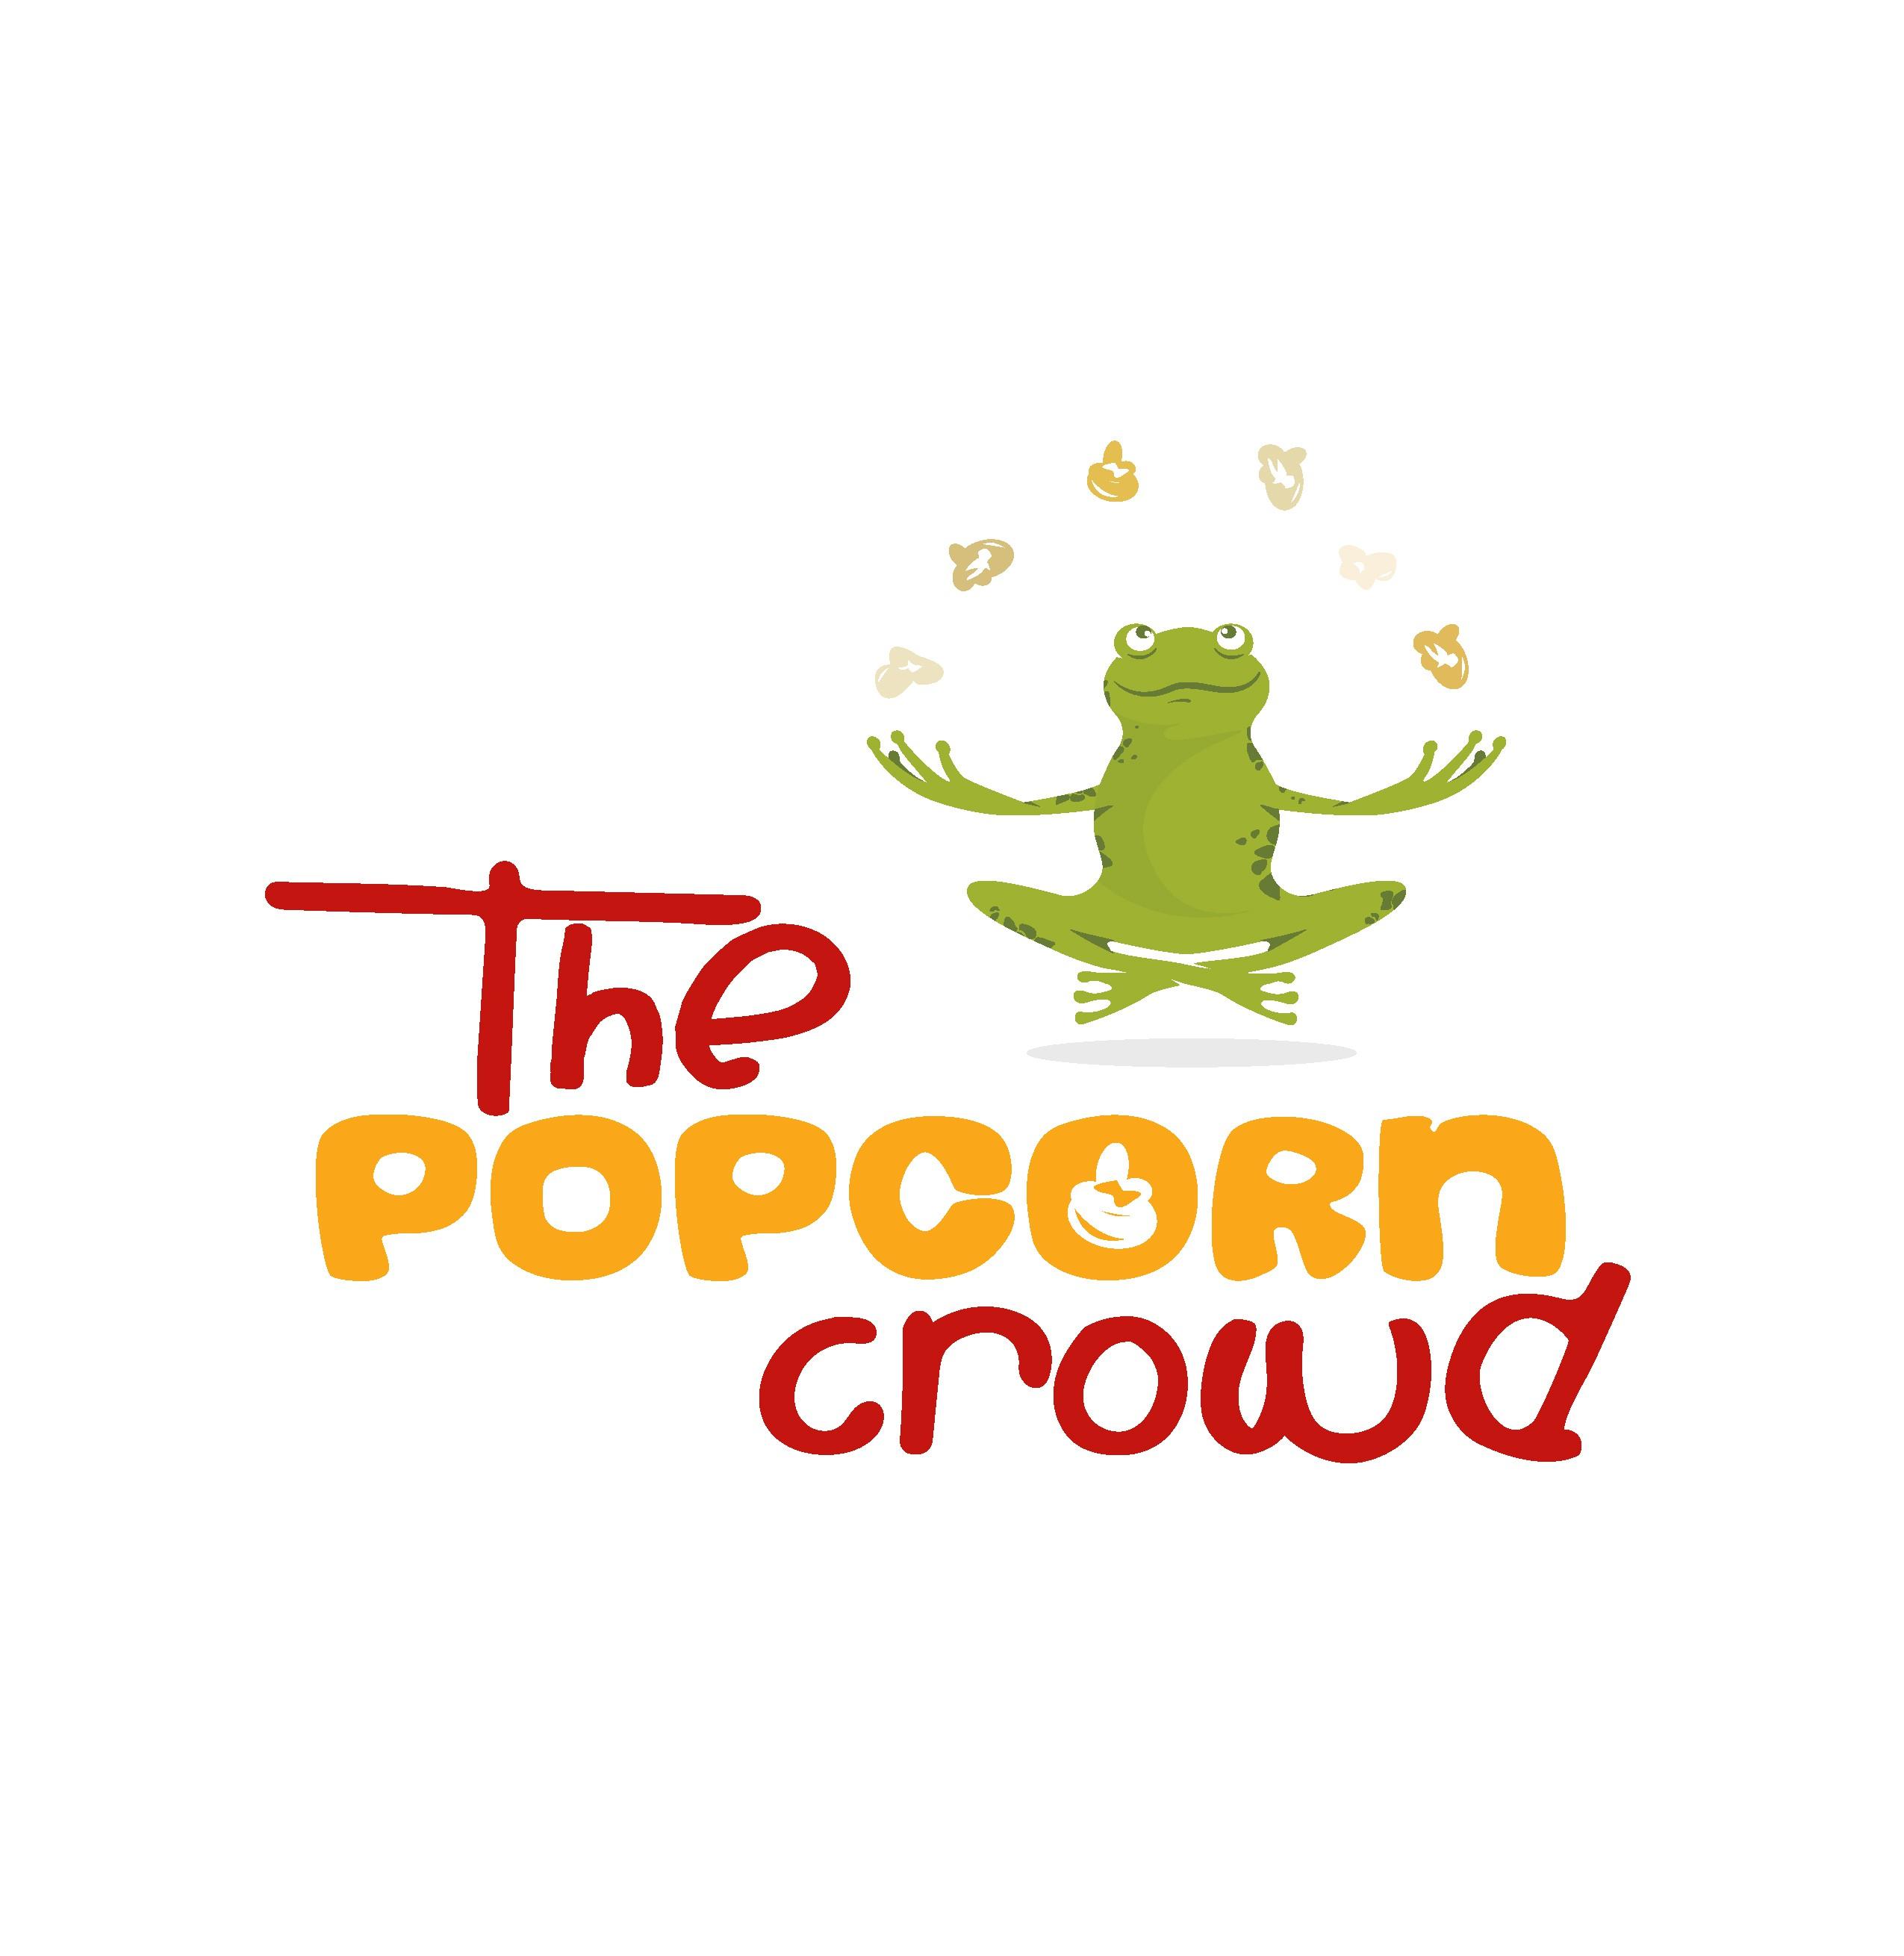 Create a fun design for a gourmet popcorn business.